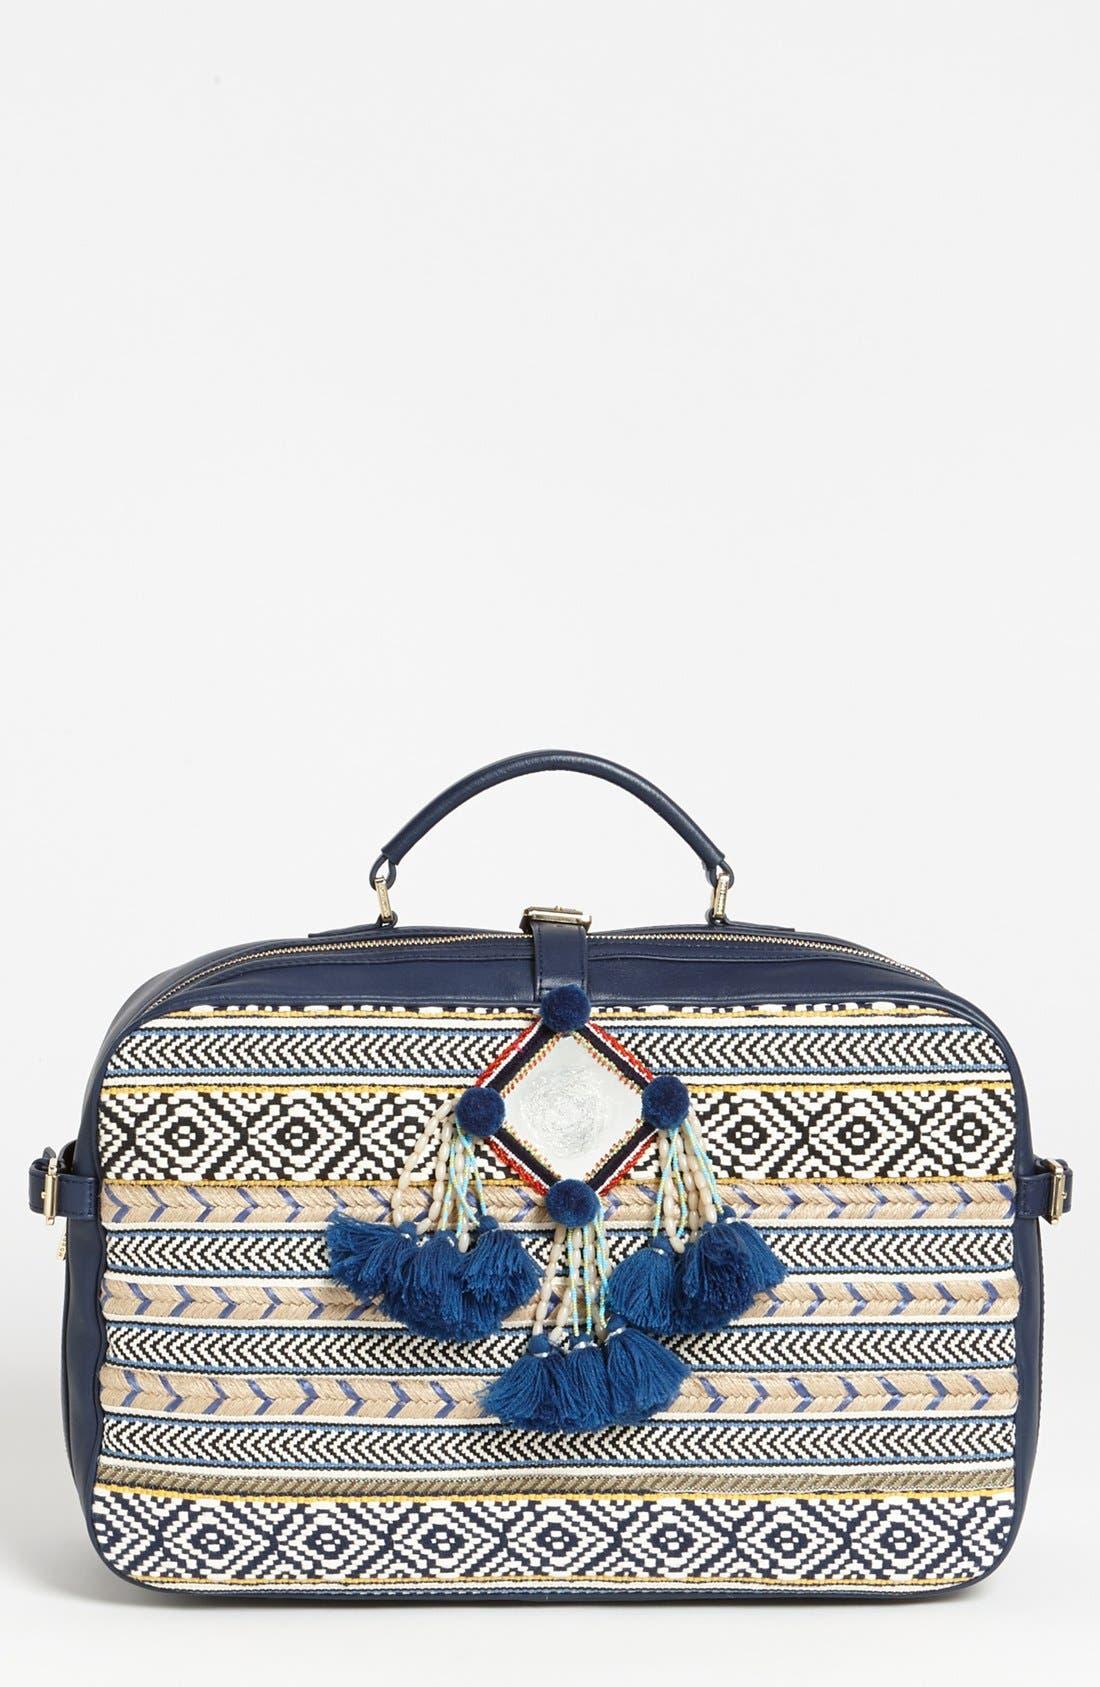 Alternate Image 1 Selected - Tory Burch 'Priscilla Mochilla' Suitcase Satchel